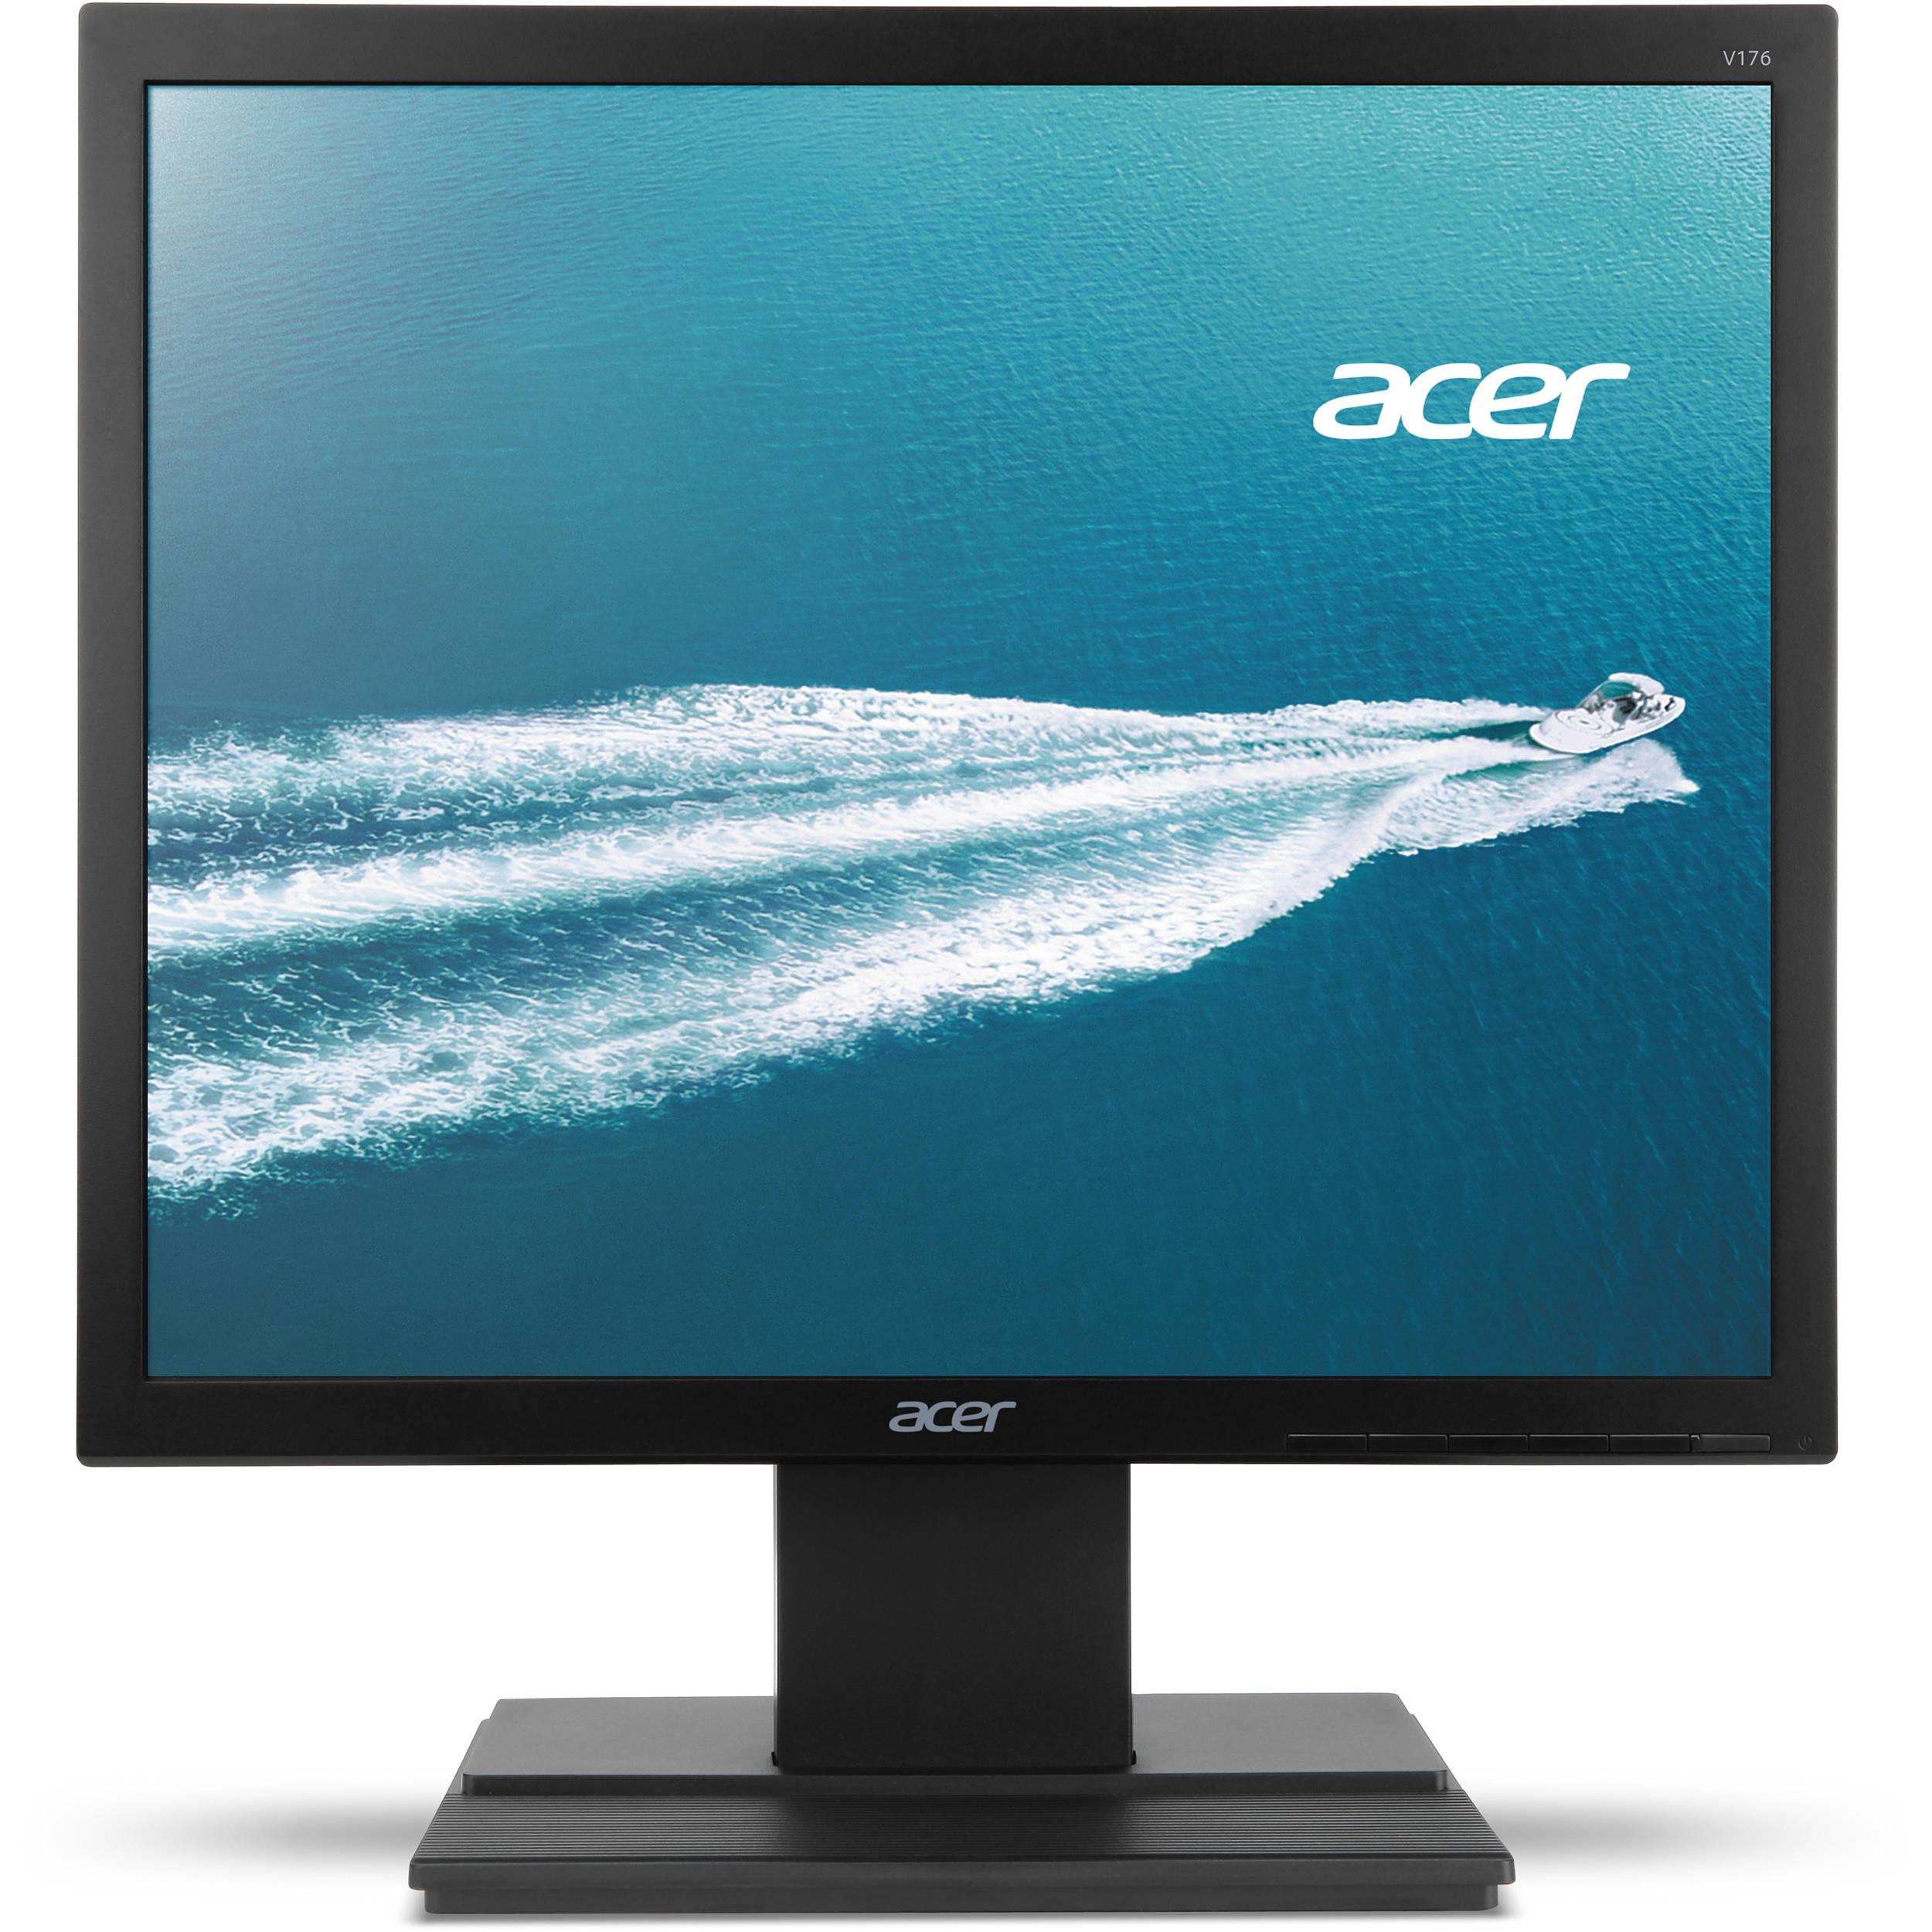 "Acer 17"" LCD Widescreen Monitor Display SXGA Screen 1280 x 1024 Black |V176LBD | Manufacturer Refurbished"